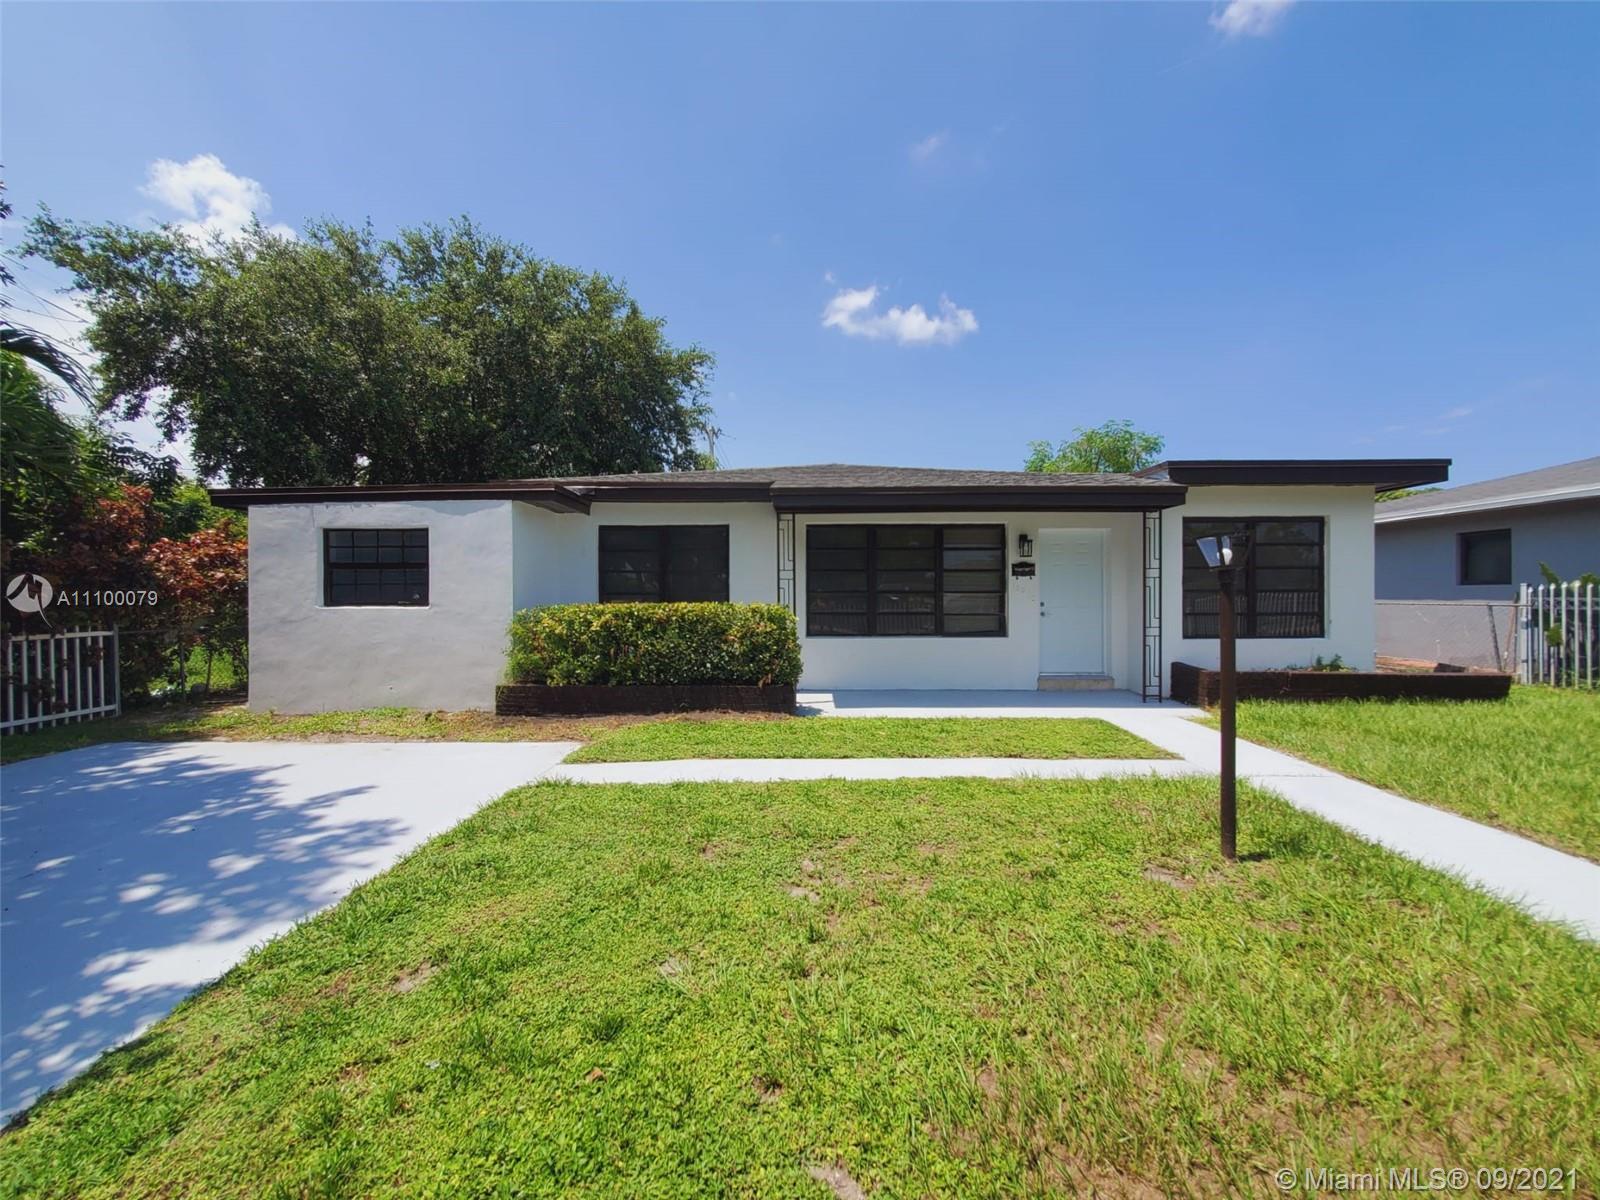 Single Family Home,For Sale,1321 NE 160th St, North Miami Beach, Florida 33162,Brickell,realty,broker,condos near me